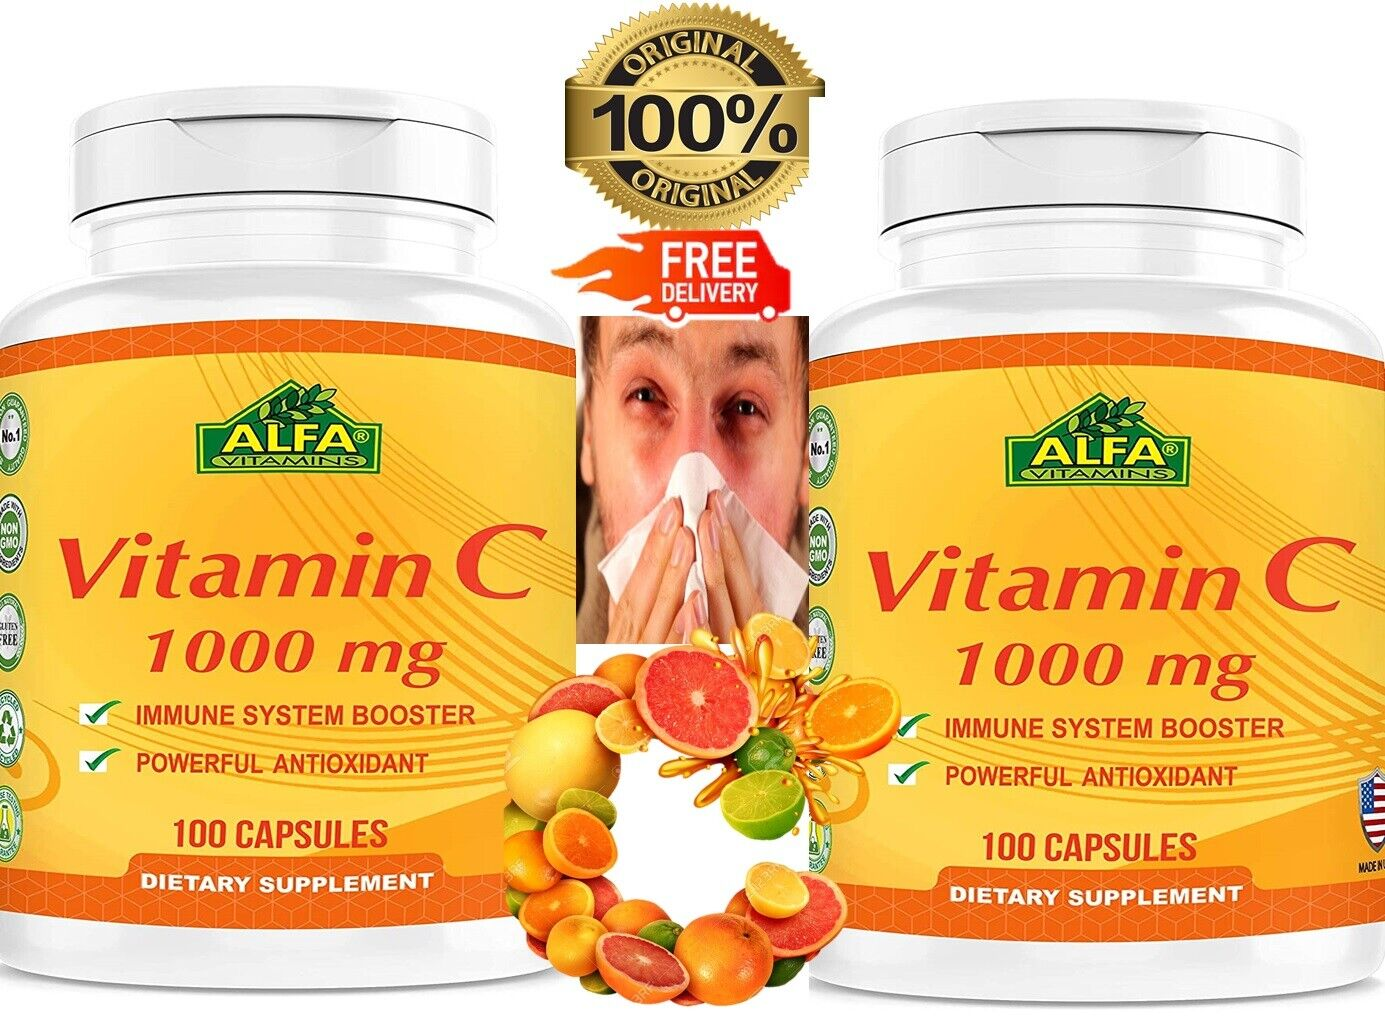 Vitamin C 1000 mg. 100 Capsules. 2 Bottles Packs.Improve Immune System 200 caps